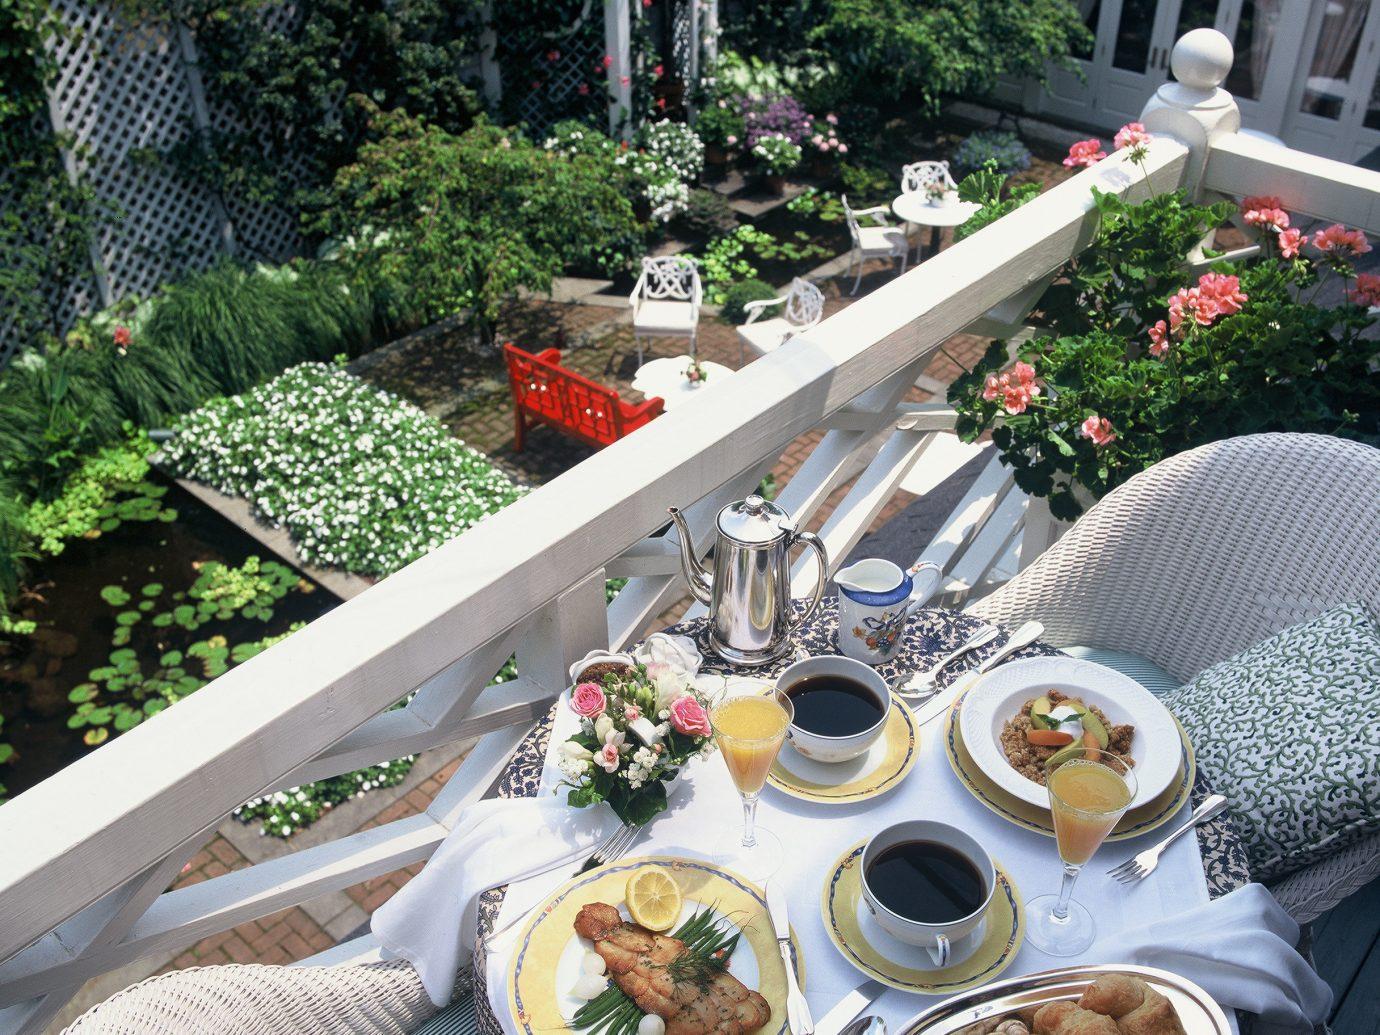 Hotels outdoor table plate meal flower backyard Garden set yard